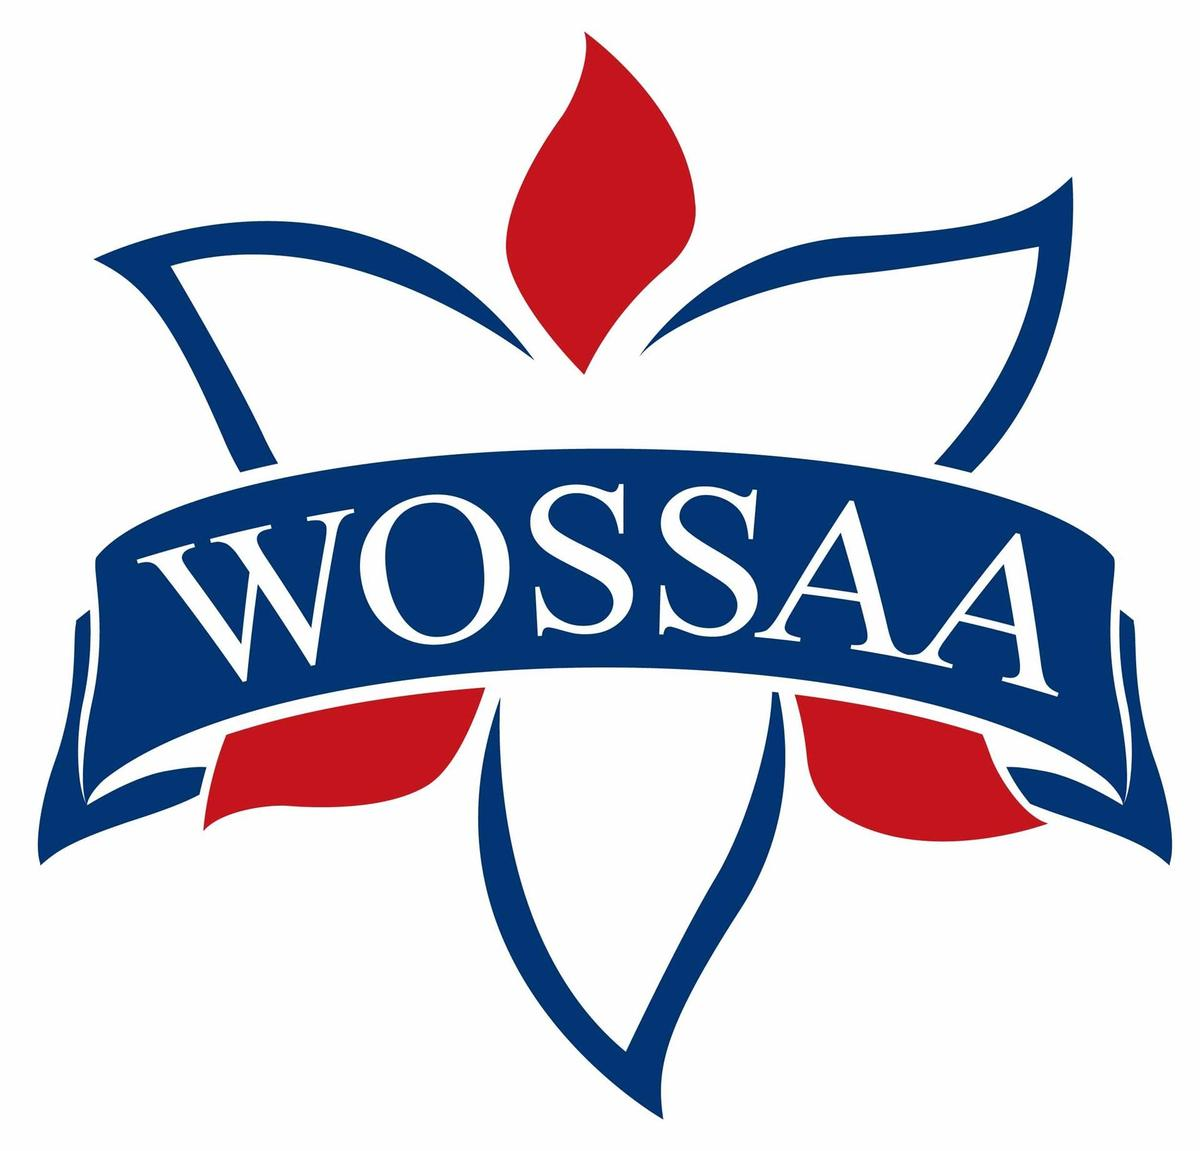 WOSSAA.jpg